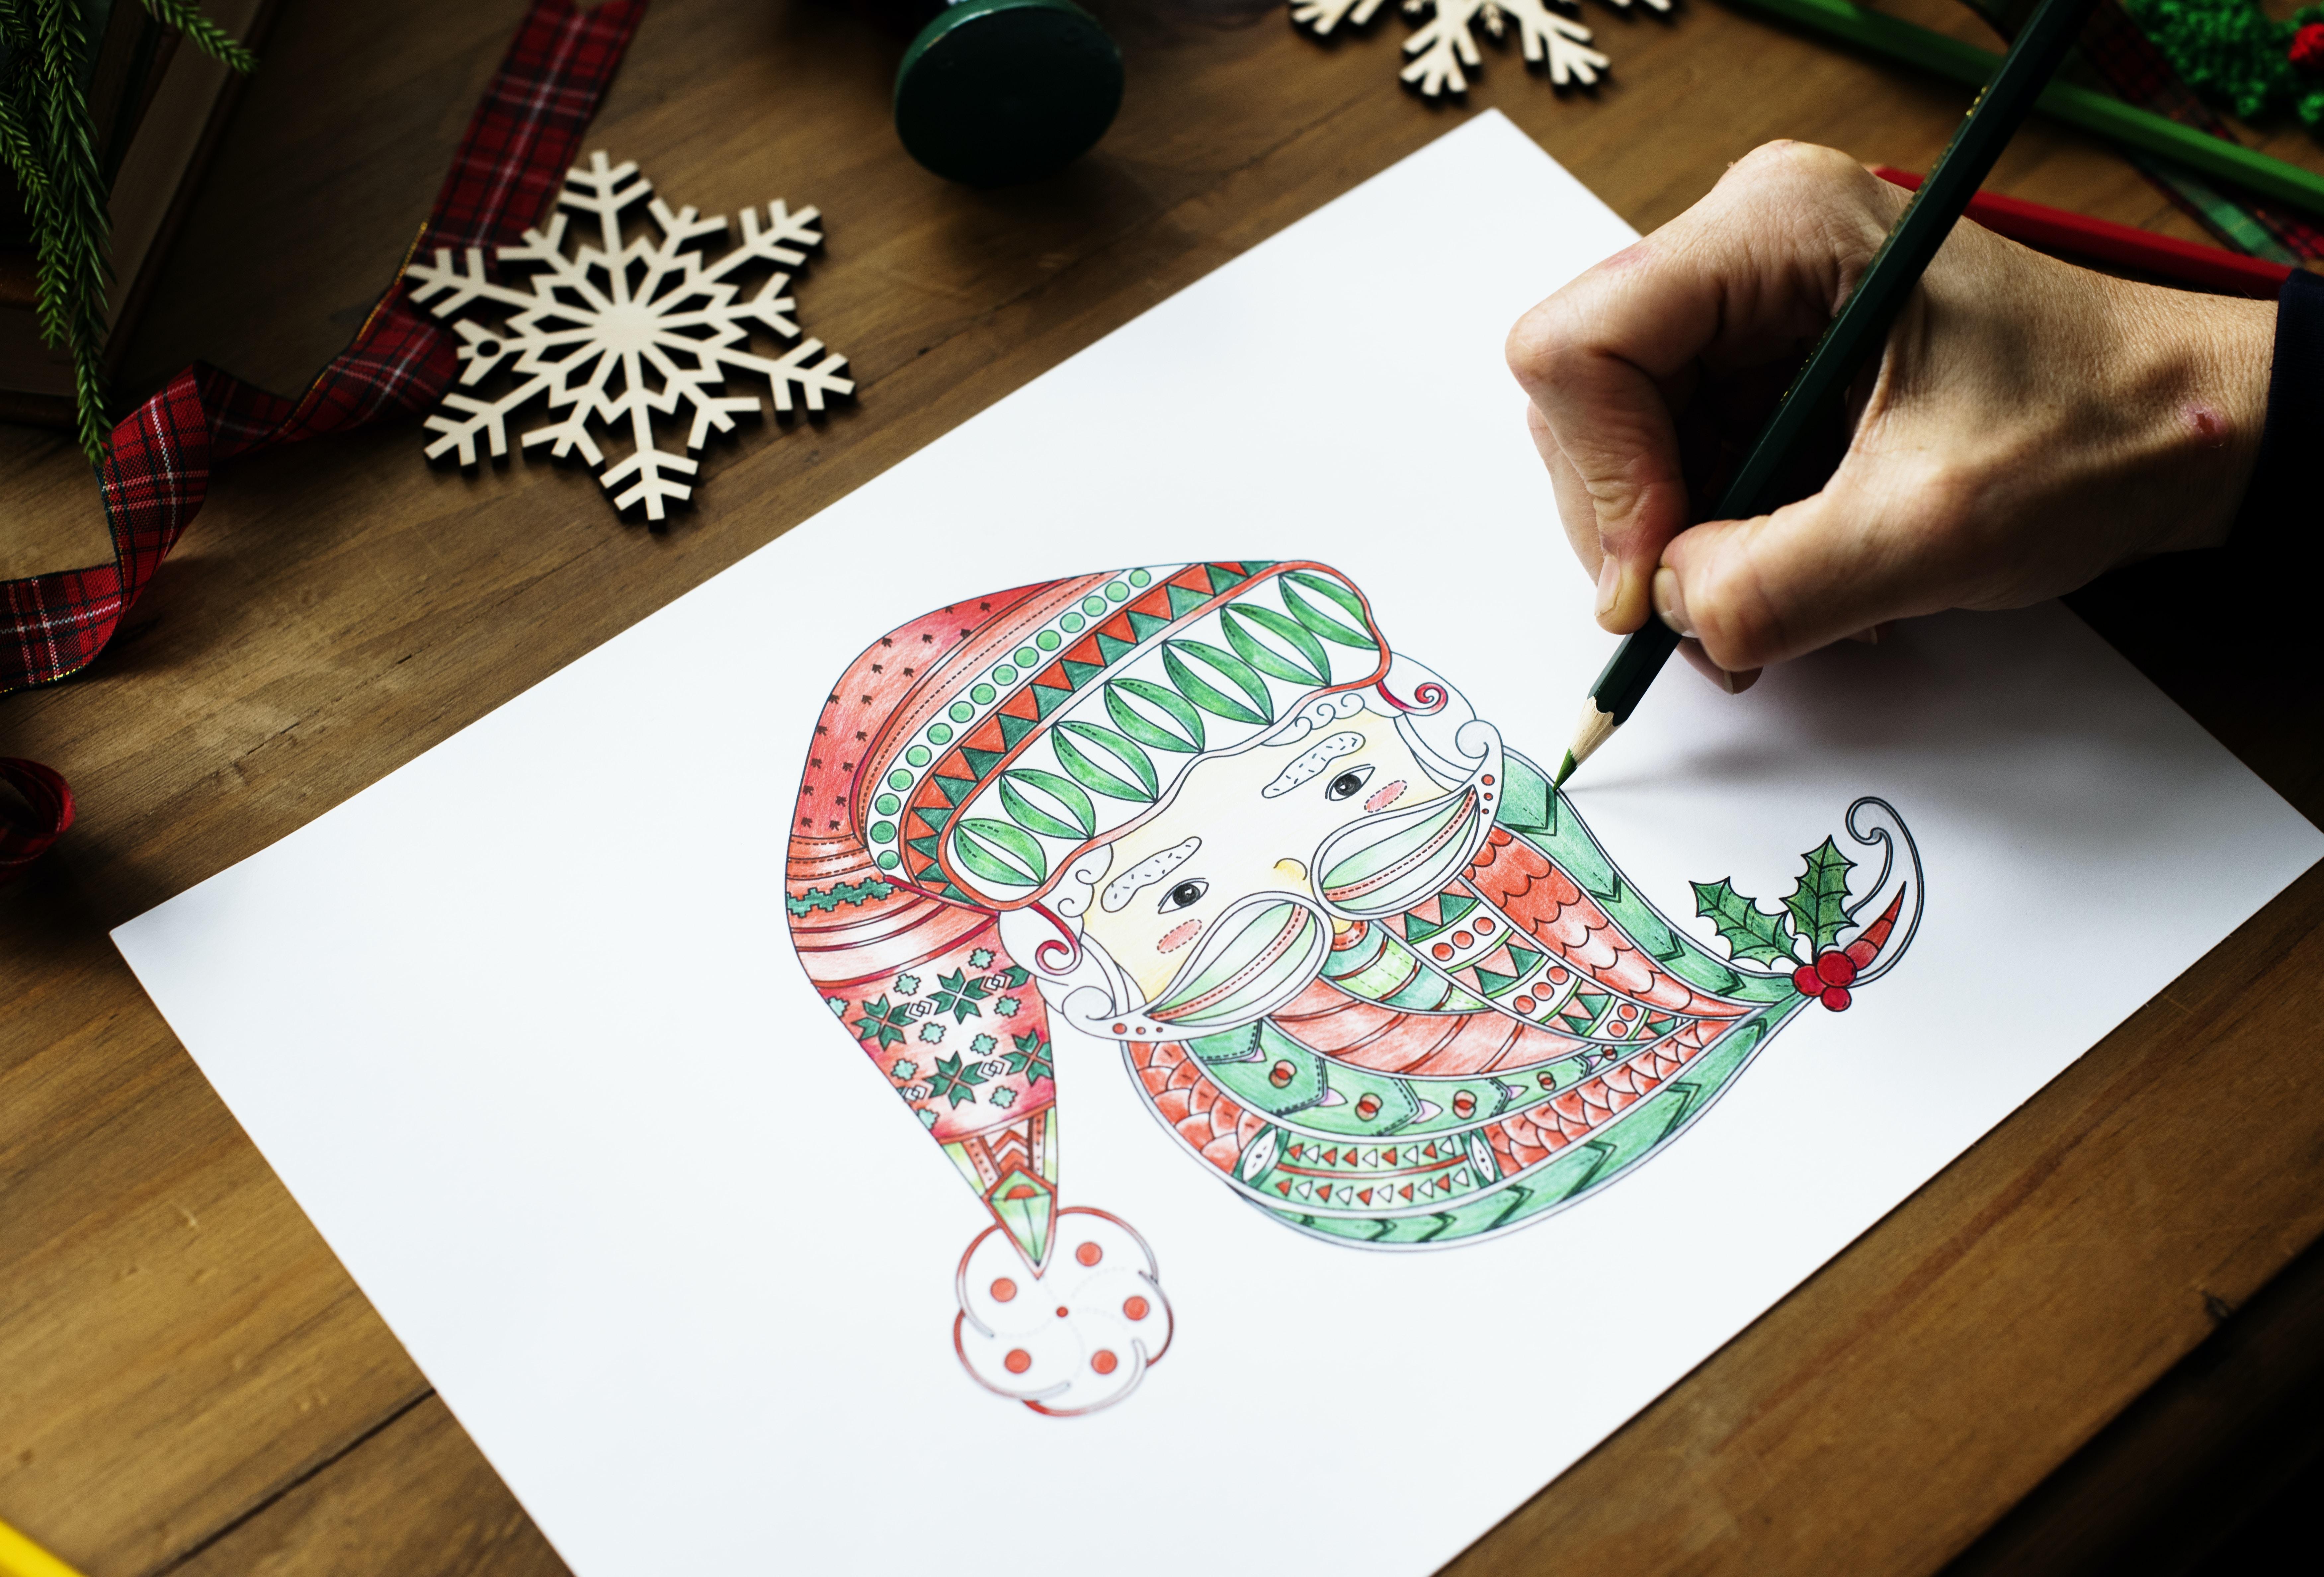 person draws Santa Claus face